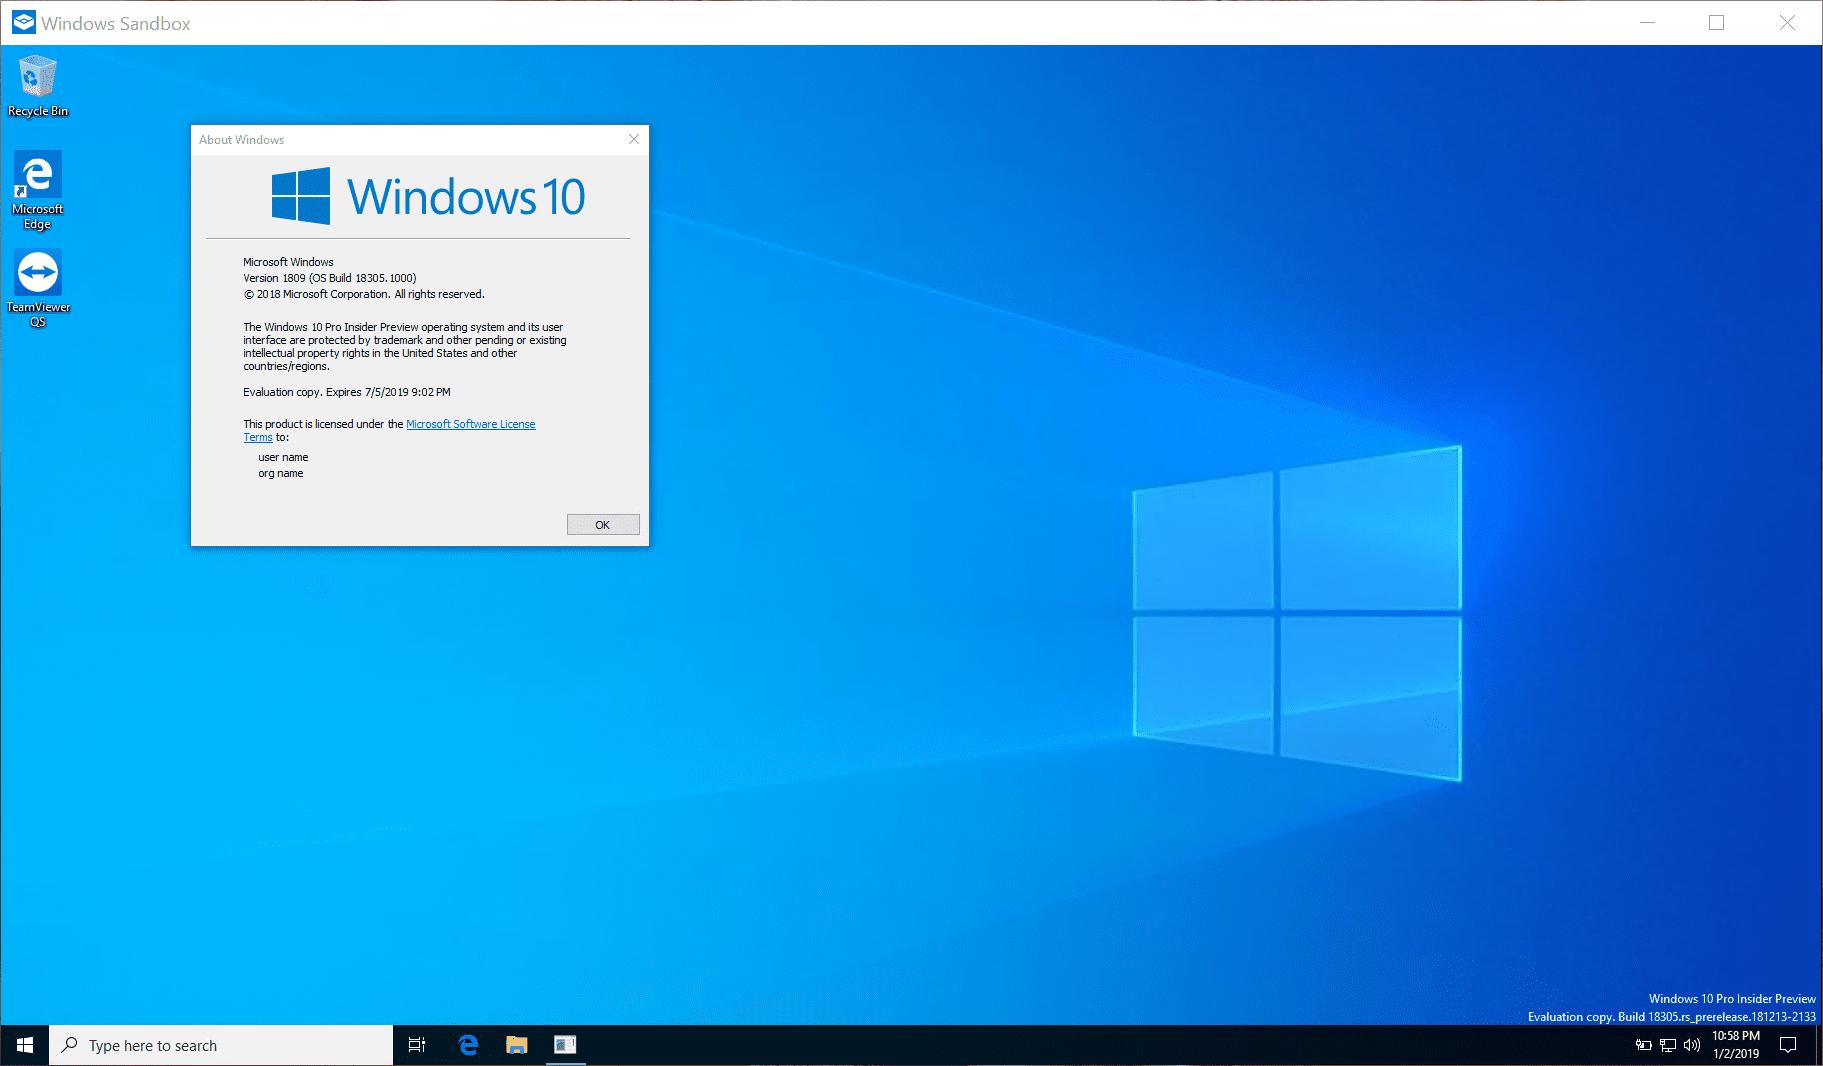 How To Use Windows Sandbox on Windows 10 - Next of Windows